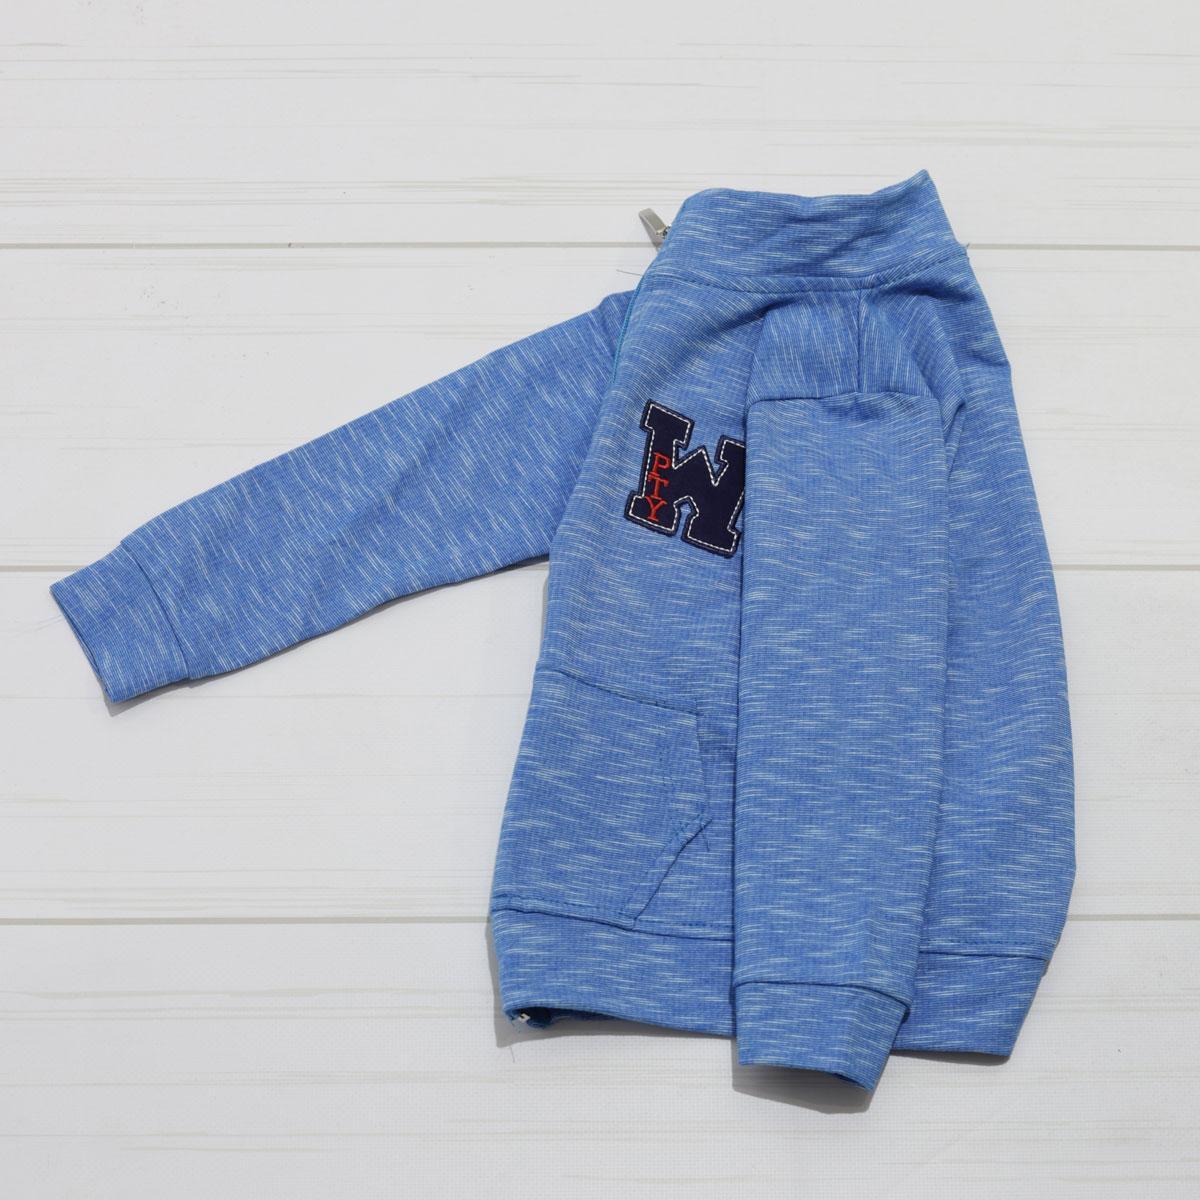 Кофта спортивная для  маьчика с длинным рукавом, на молнии, х/б, Paty Kids